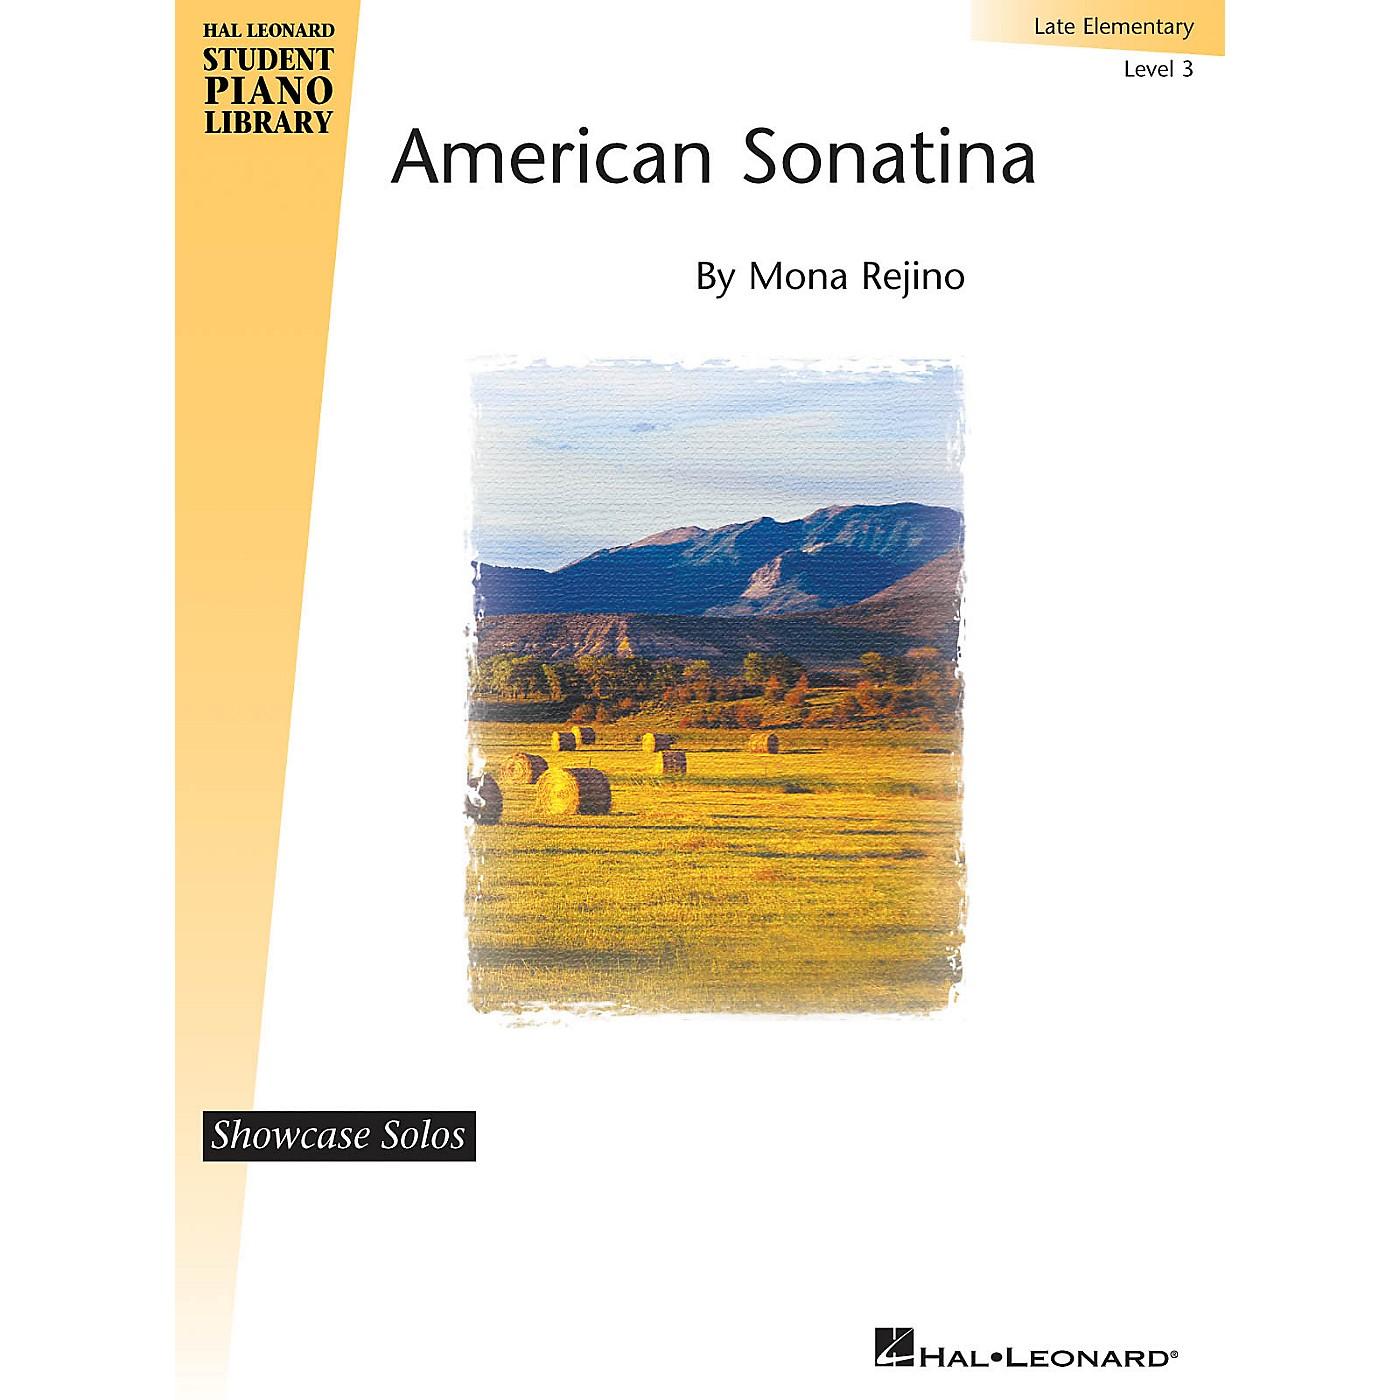 Hal Leonard American Sonatina Piano Library Series by Mona Rejino (Level Late Elem) thumbnail